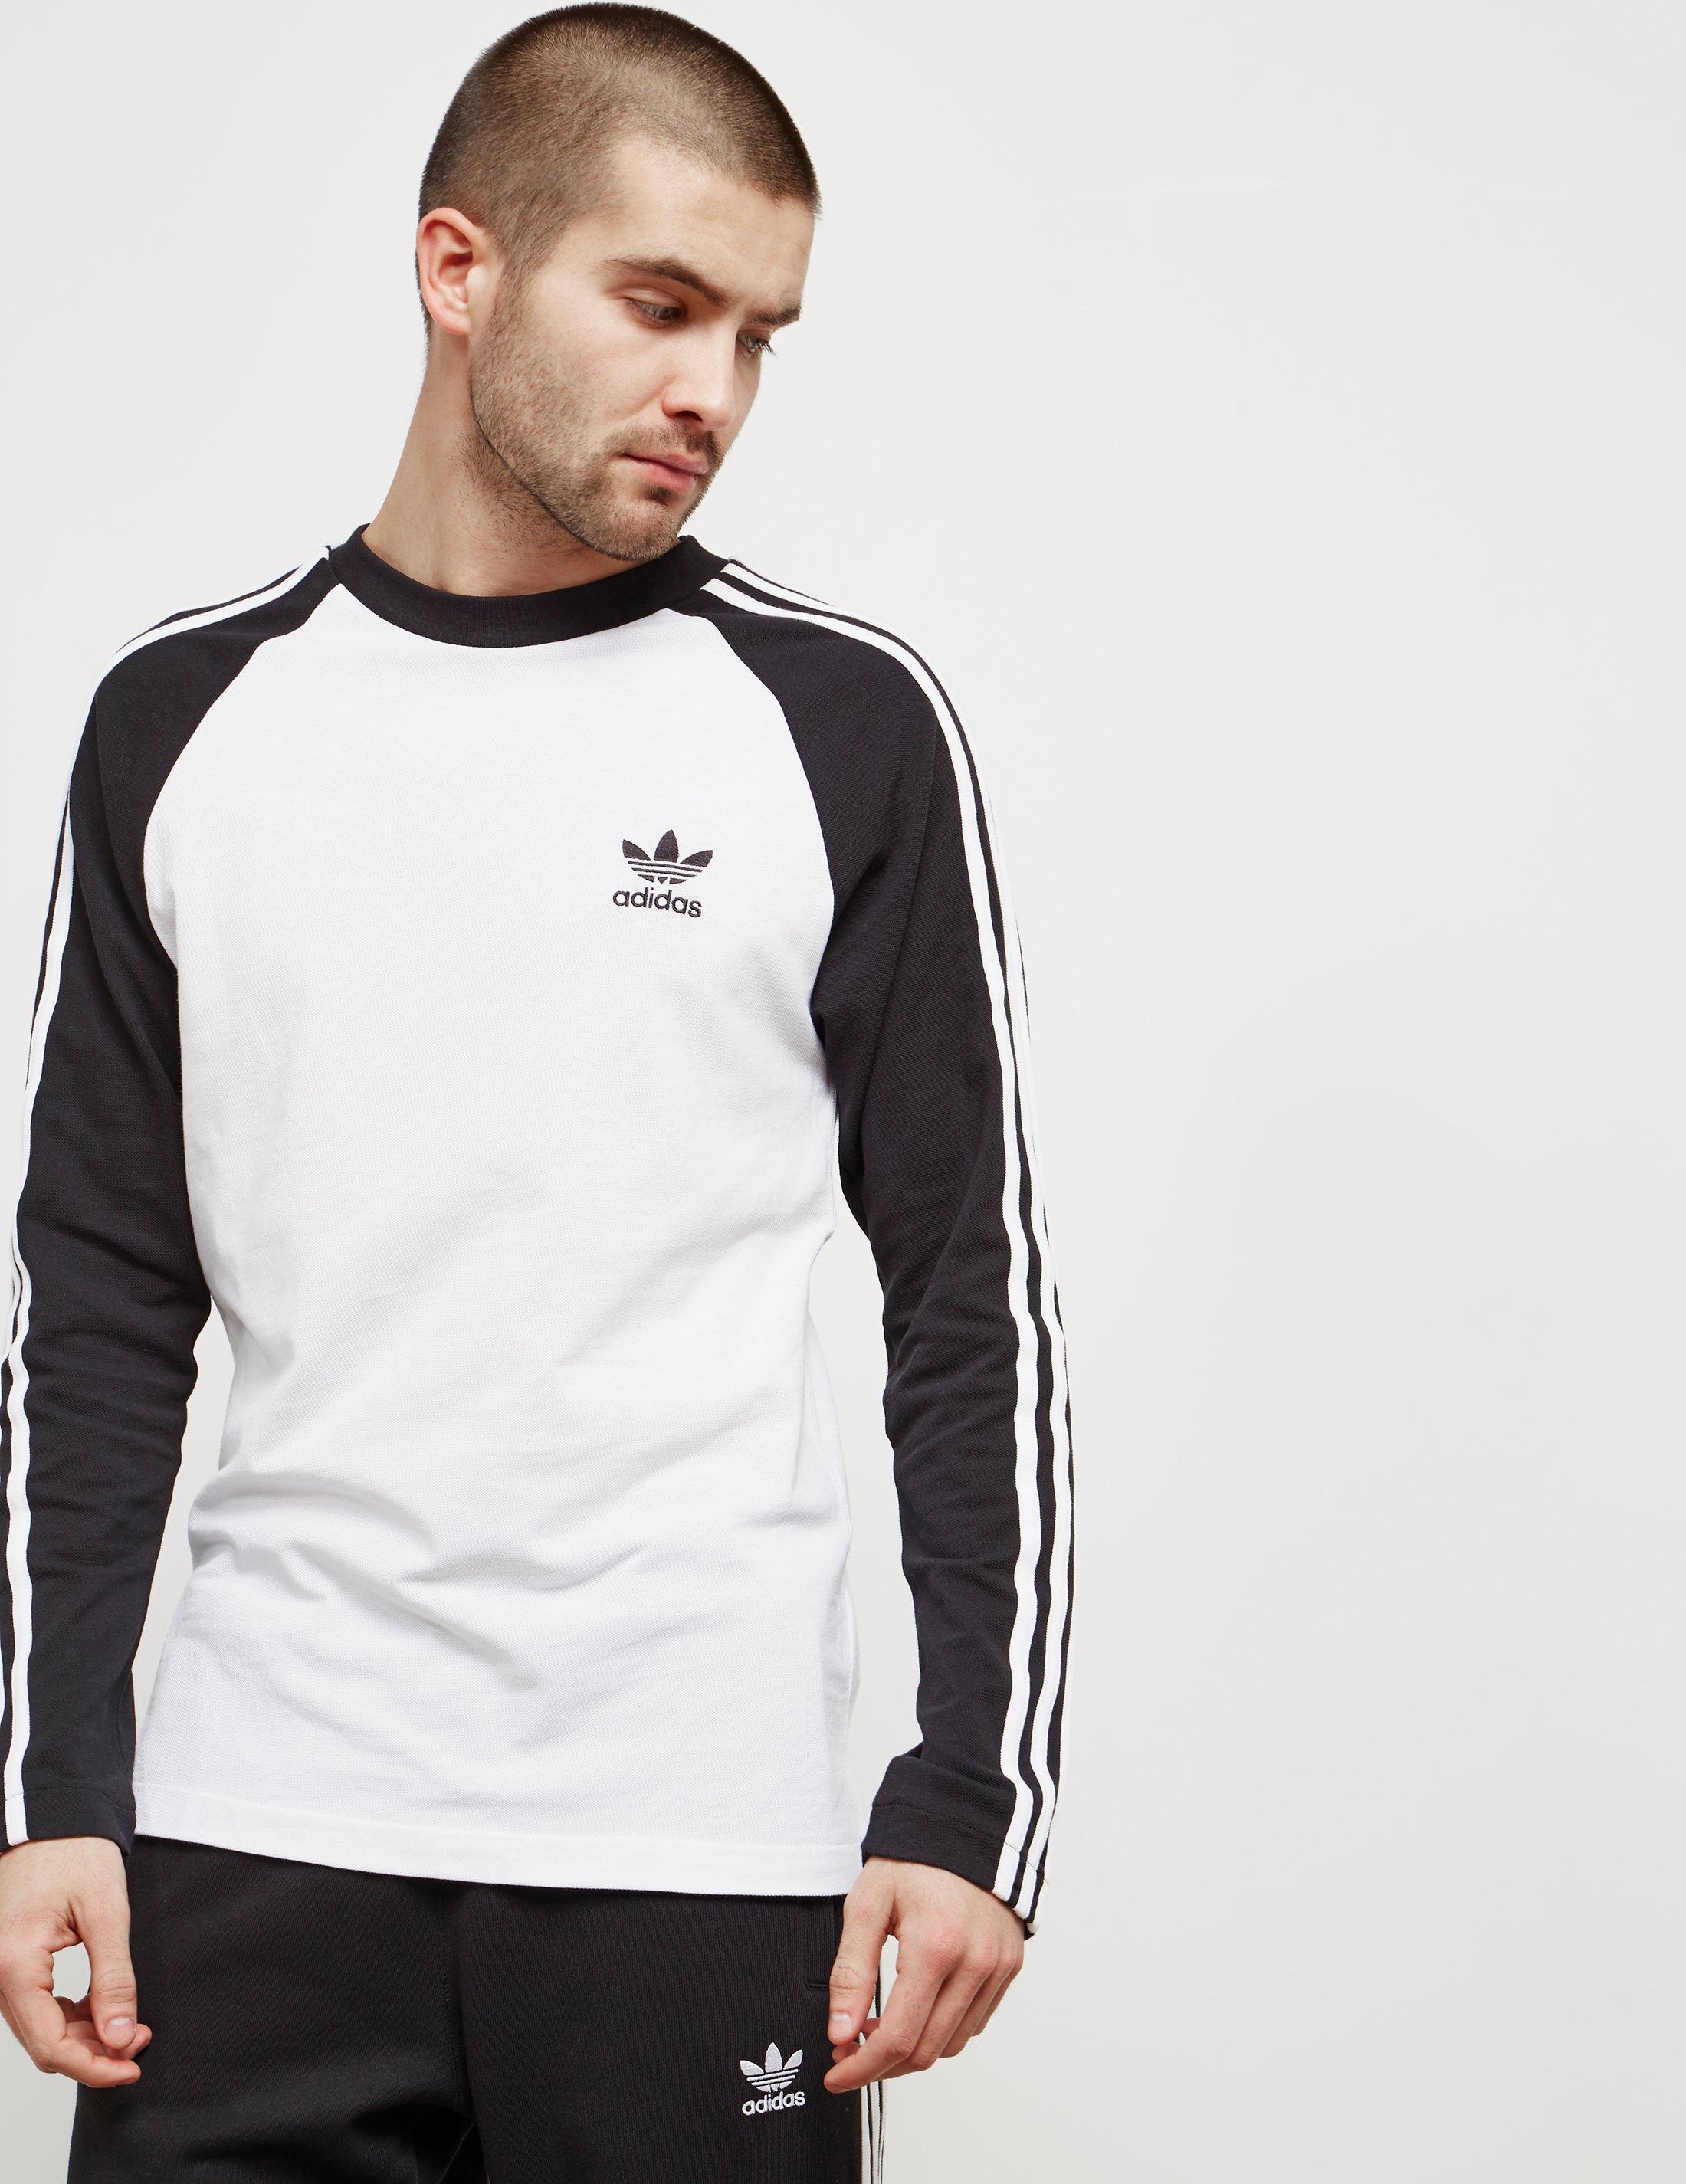 b0503fd4049d Lyst - adidas Originals Mens 3-stripe Long Sleeved T-shirt White ...